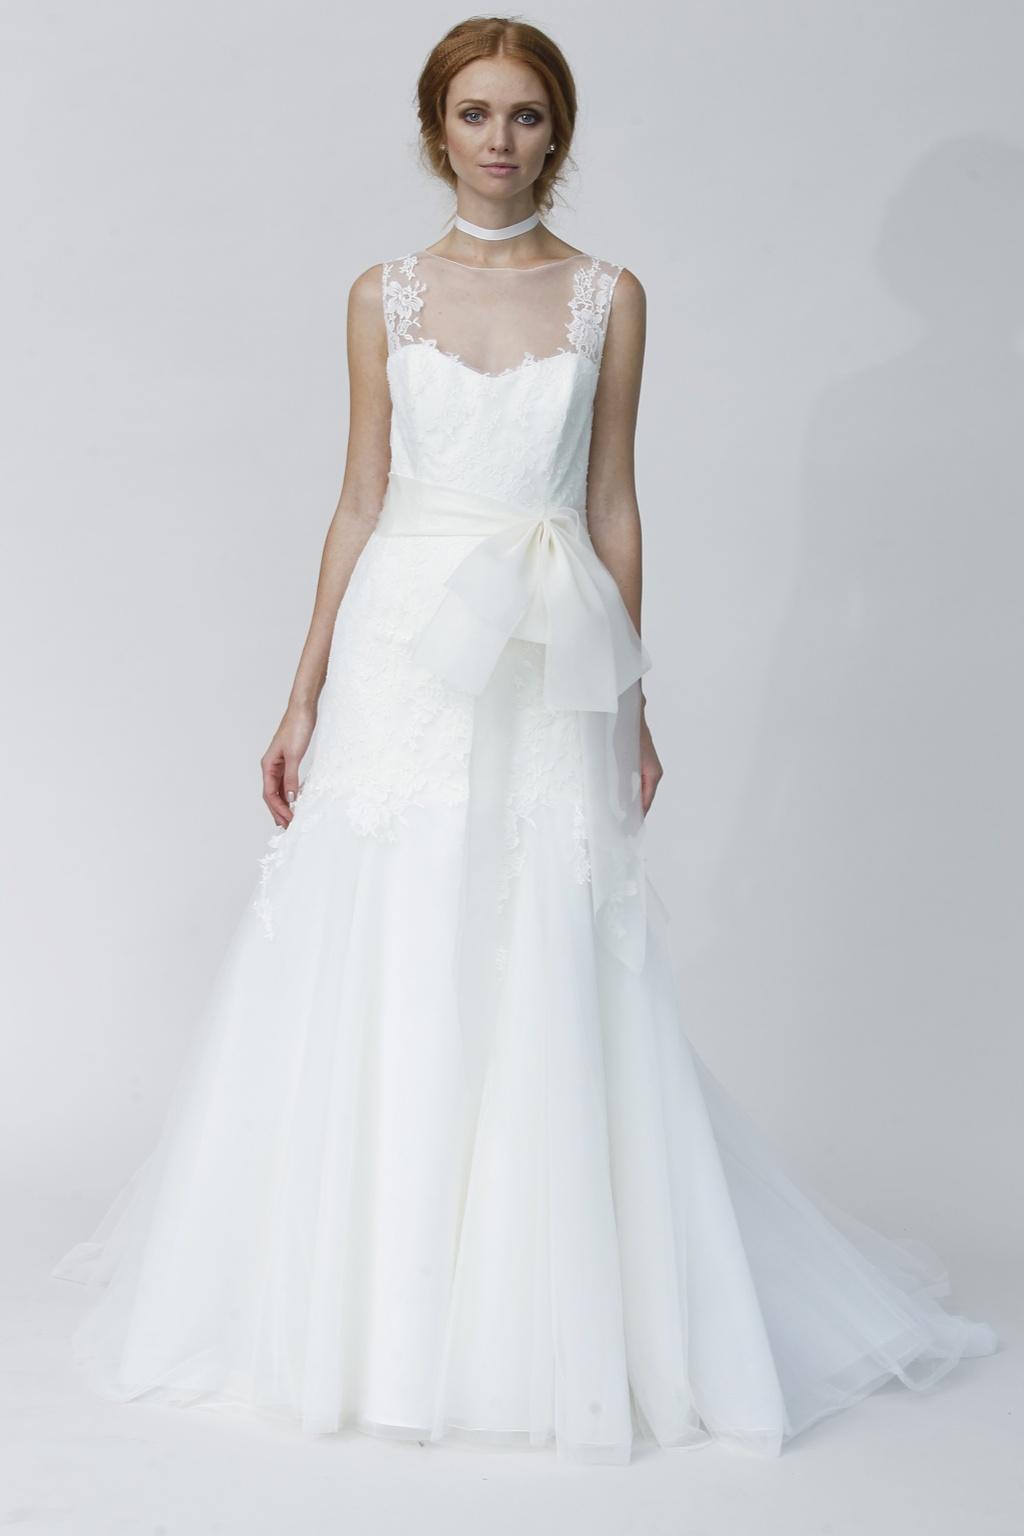 Giuliana-wedding-dress-by-rivini-fall-2014-bridal.full